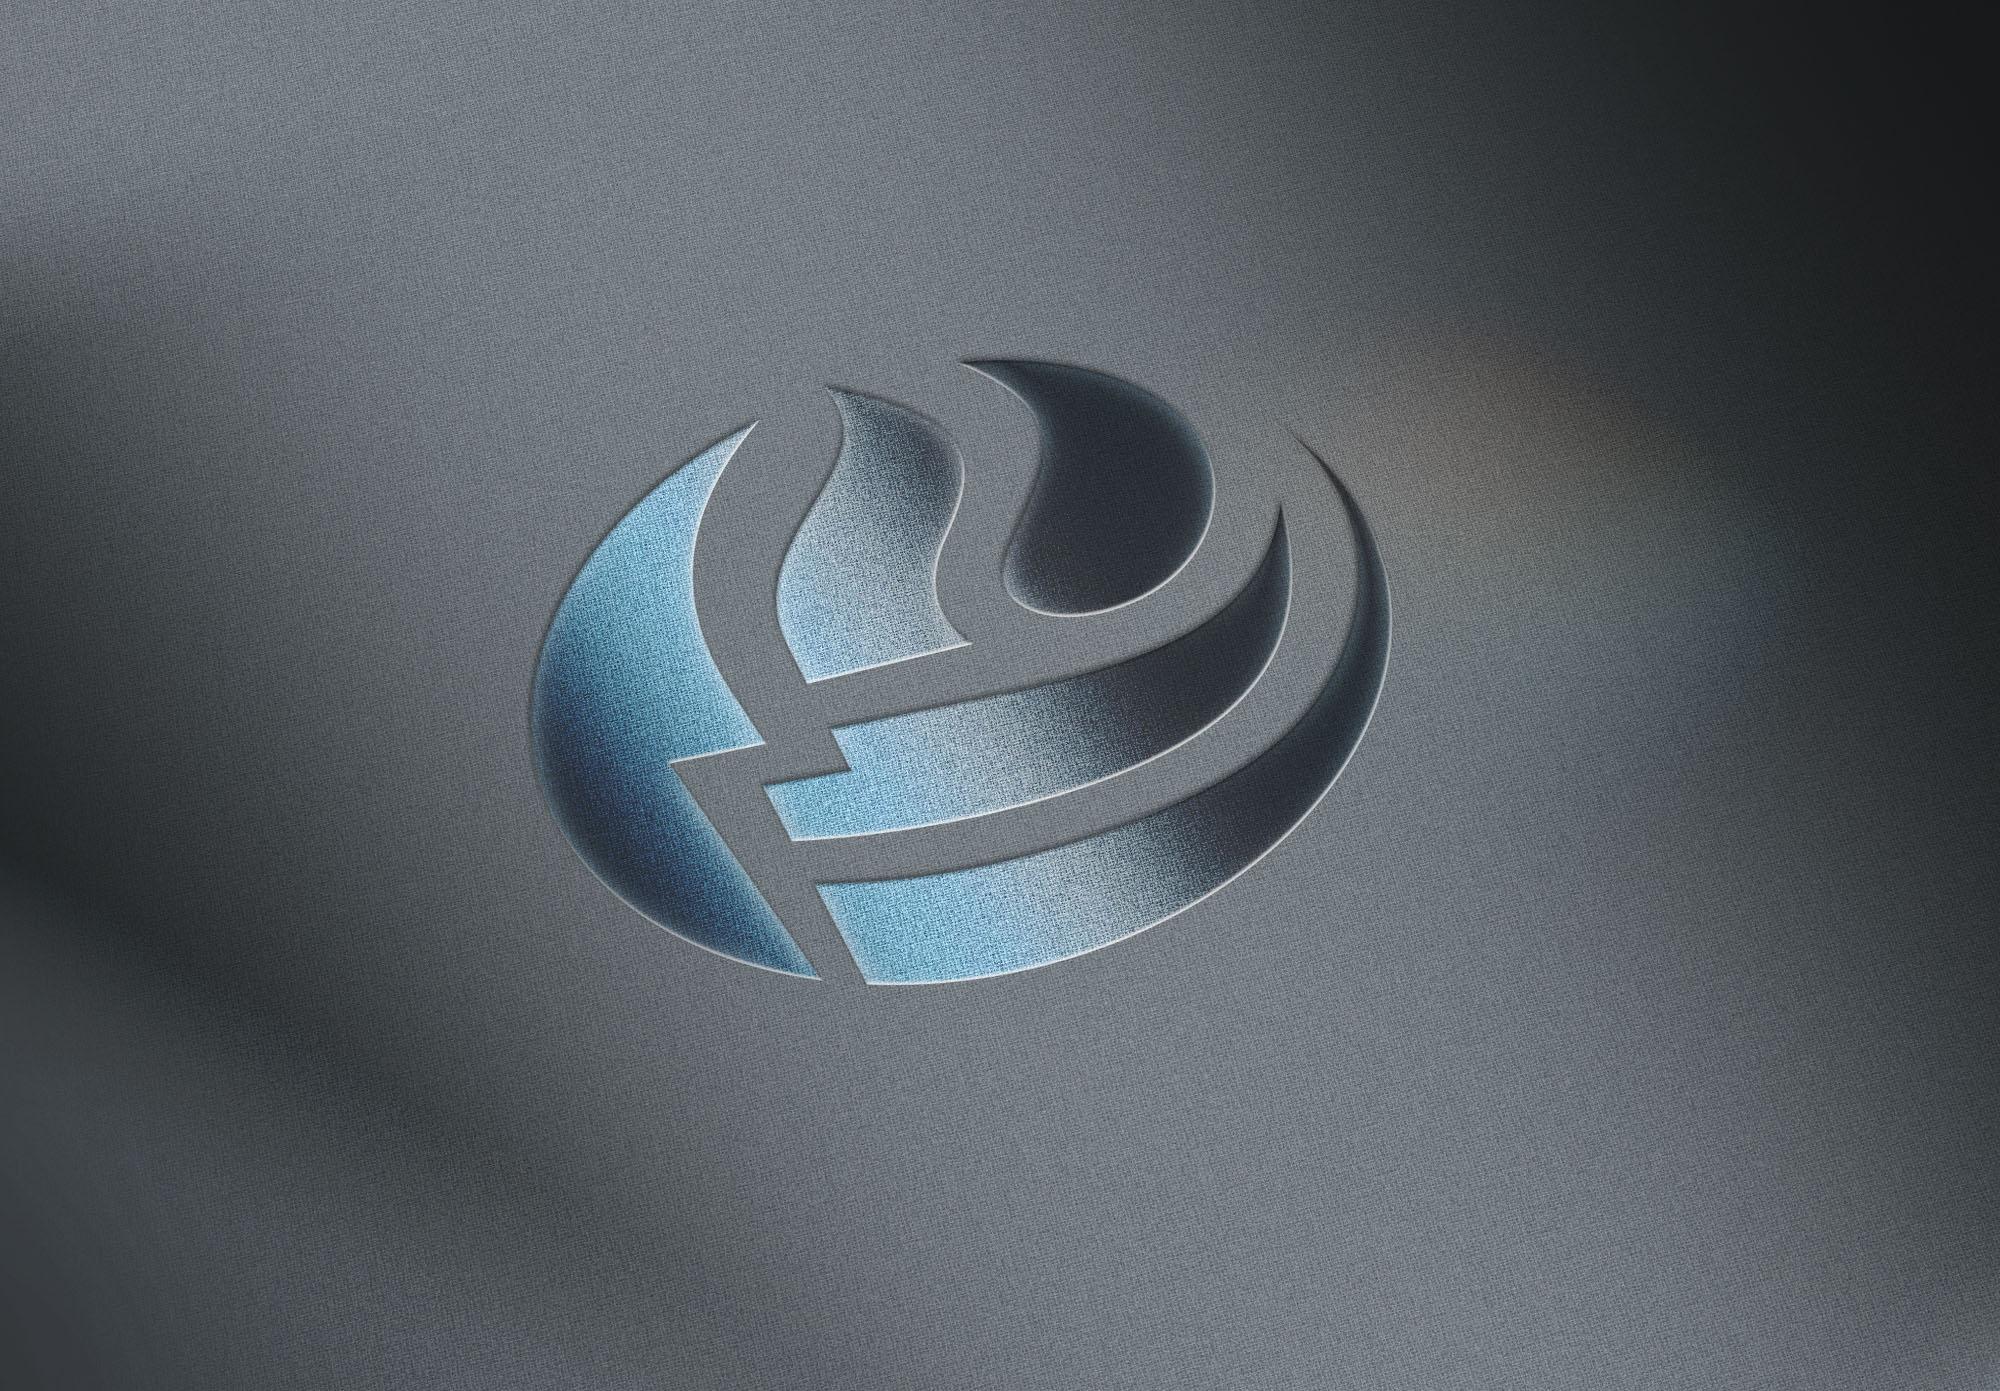 Срочно! Дизайн логотипа ООО «СЭТ» фото f_6955d52a91c1bcad.jpg